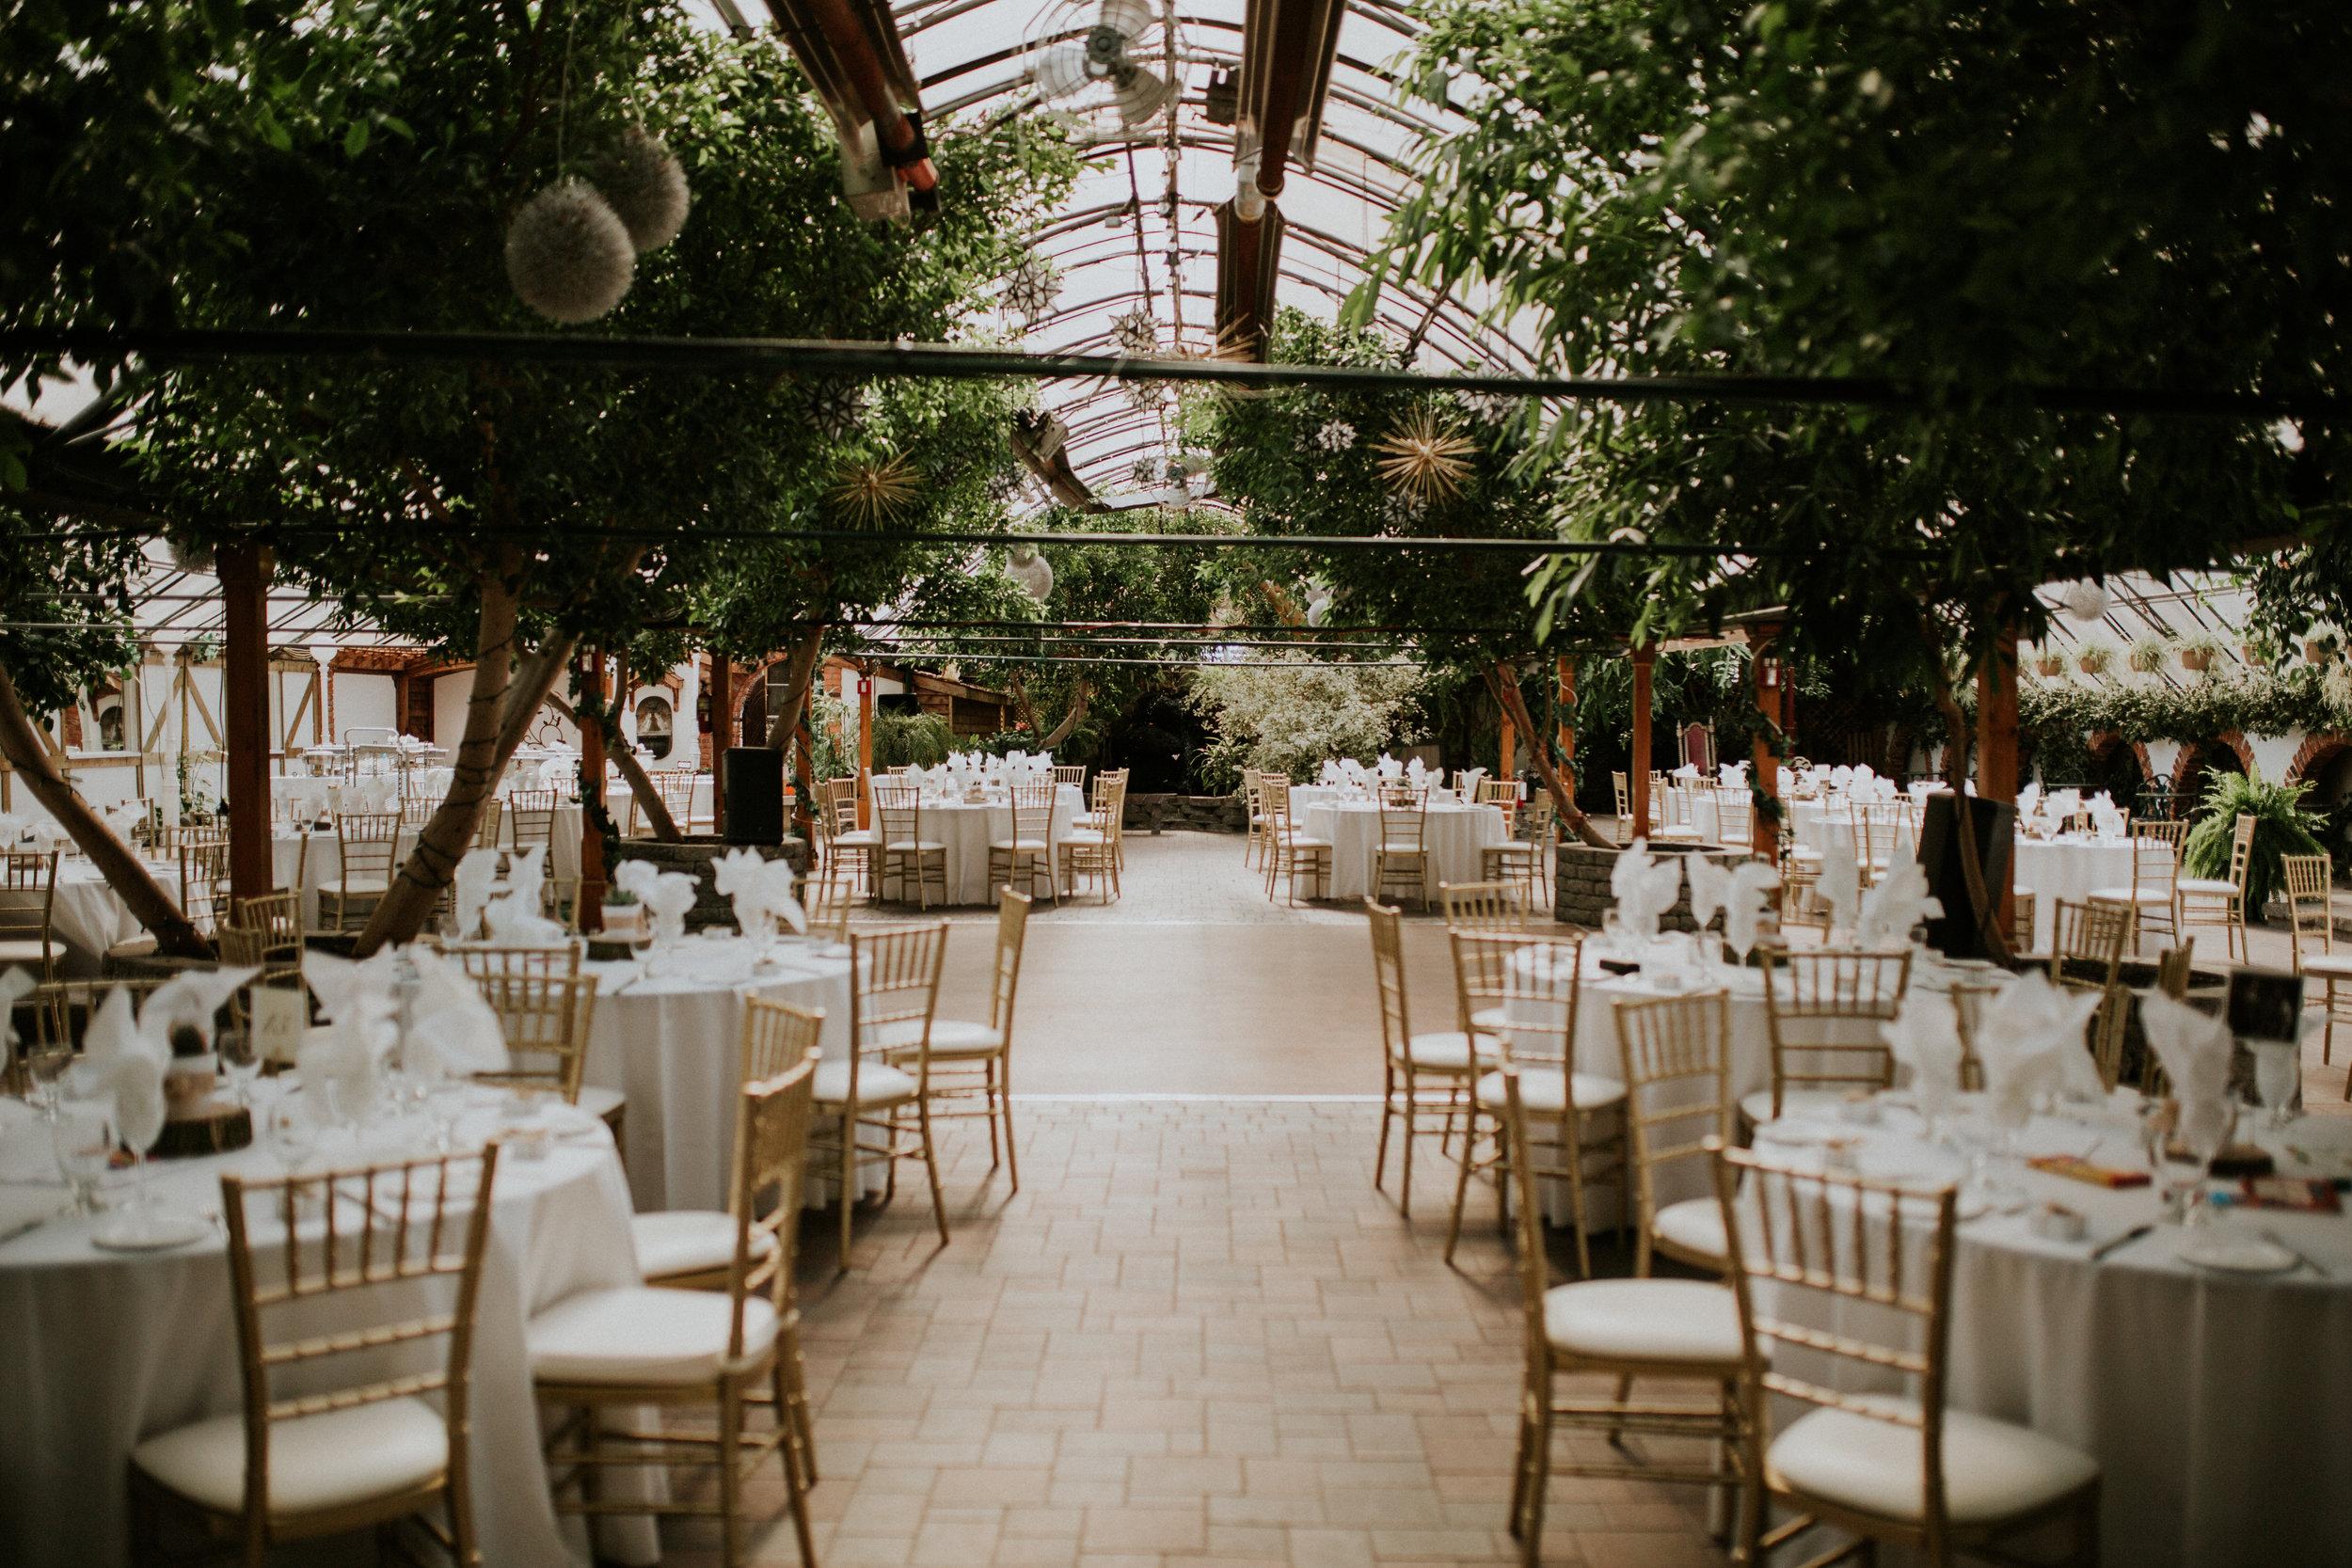 Reception setup at a green house wedding at Madsen's greenhouse